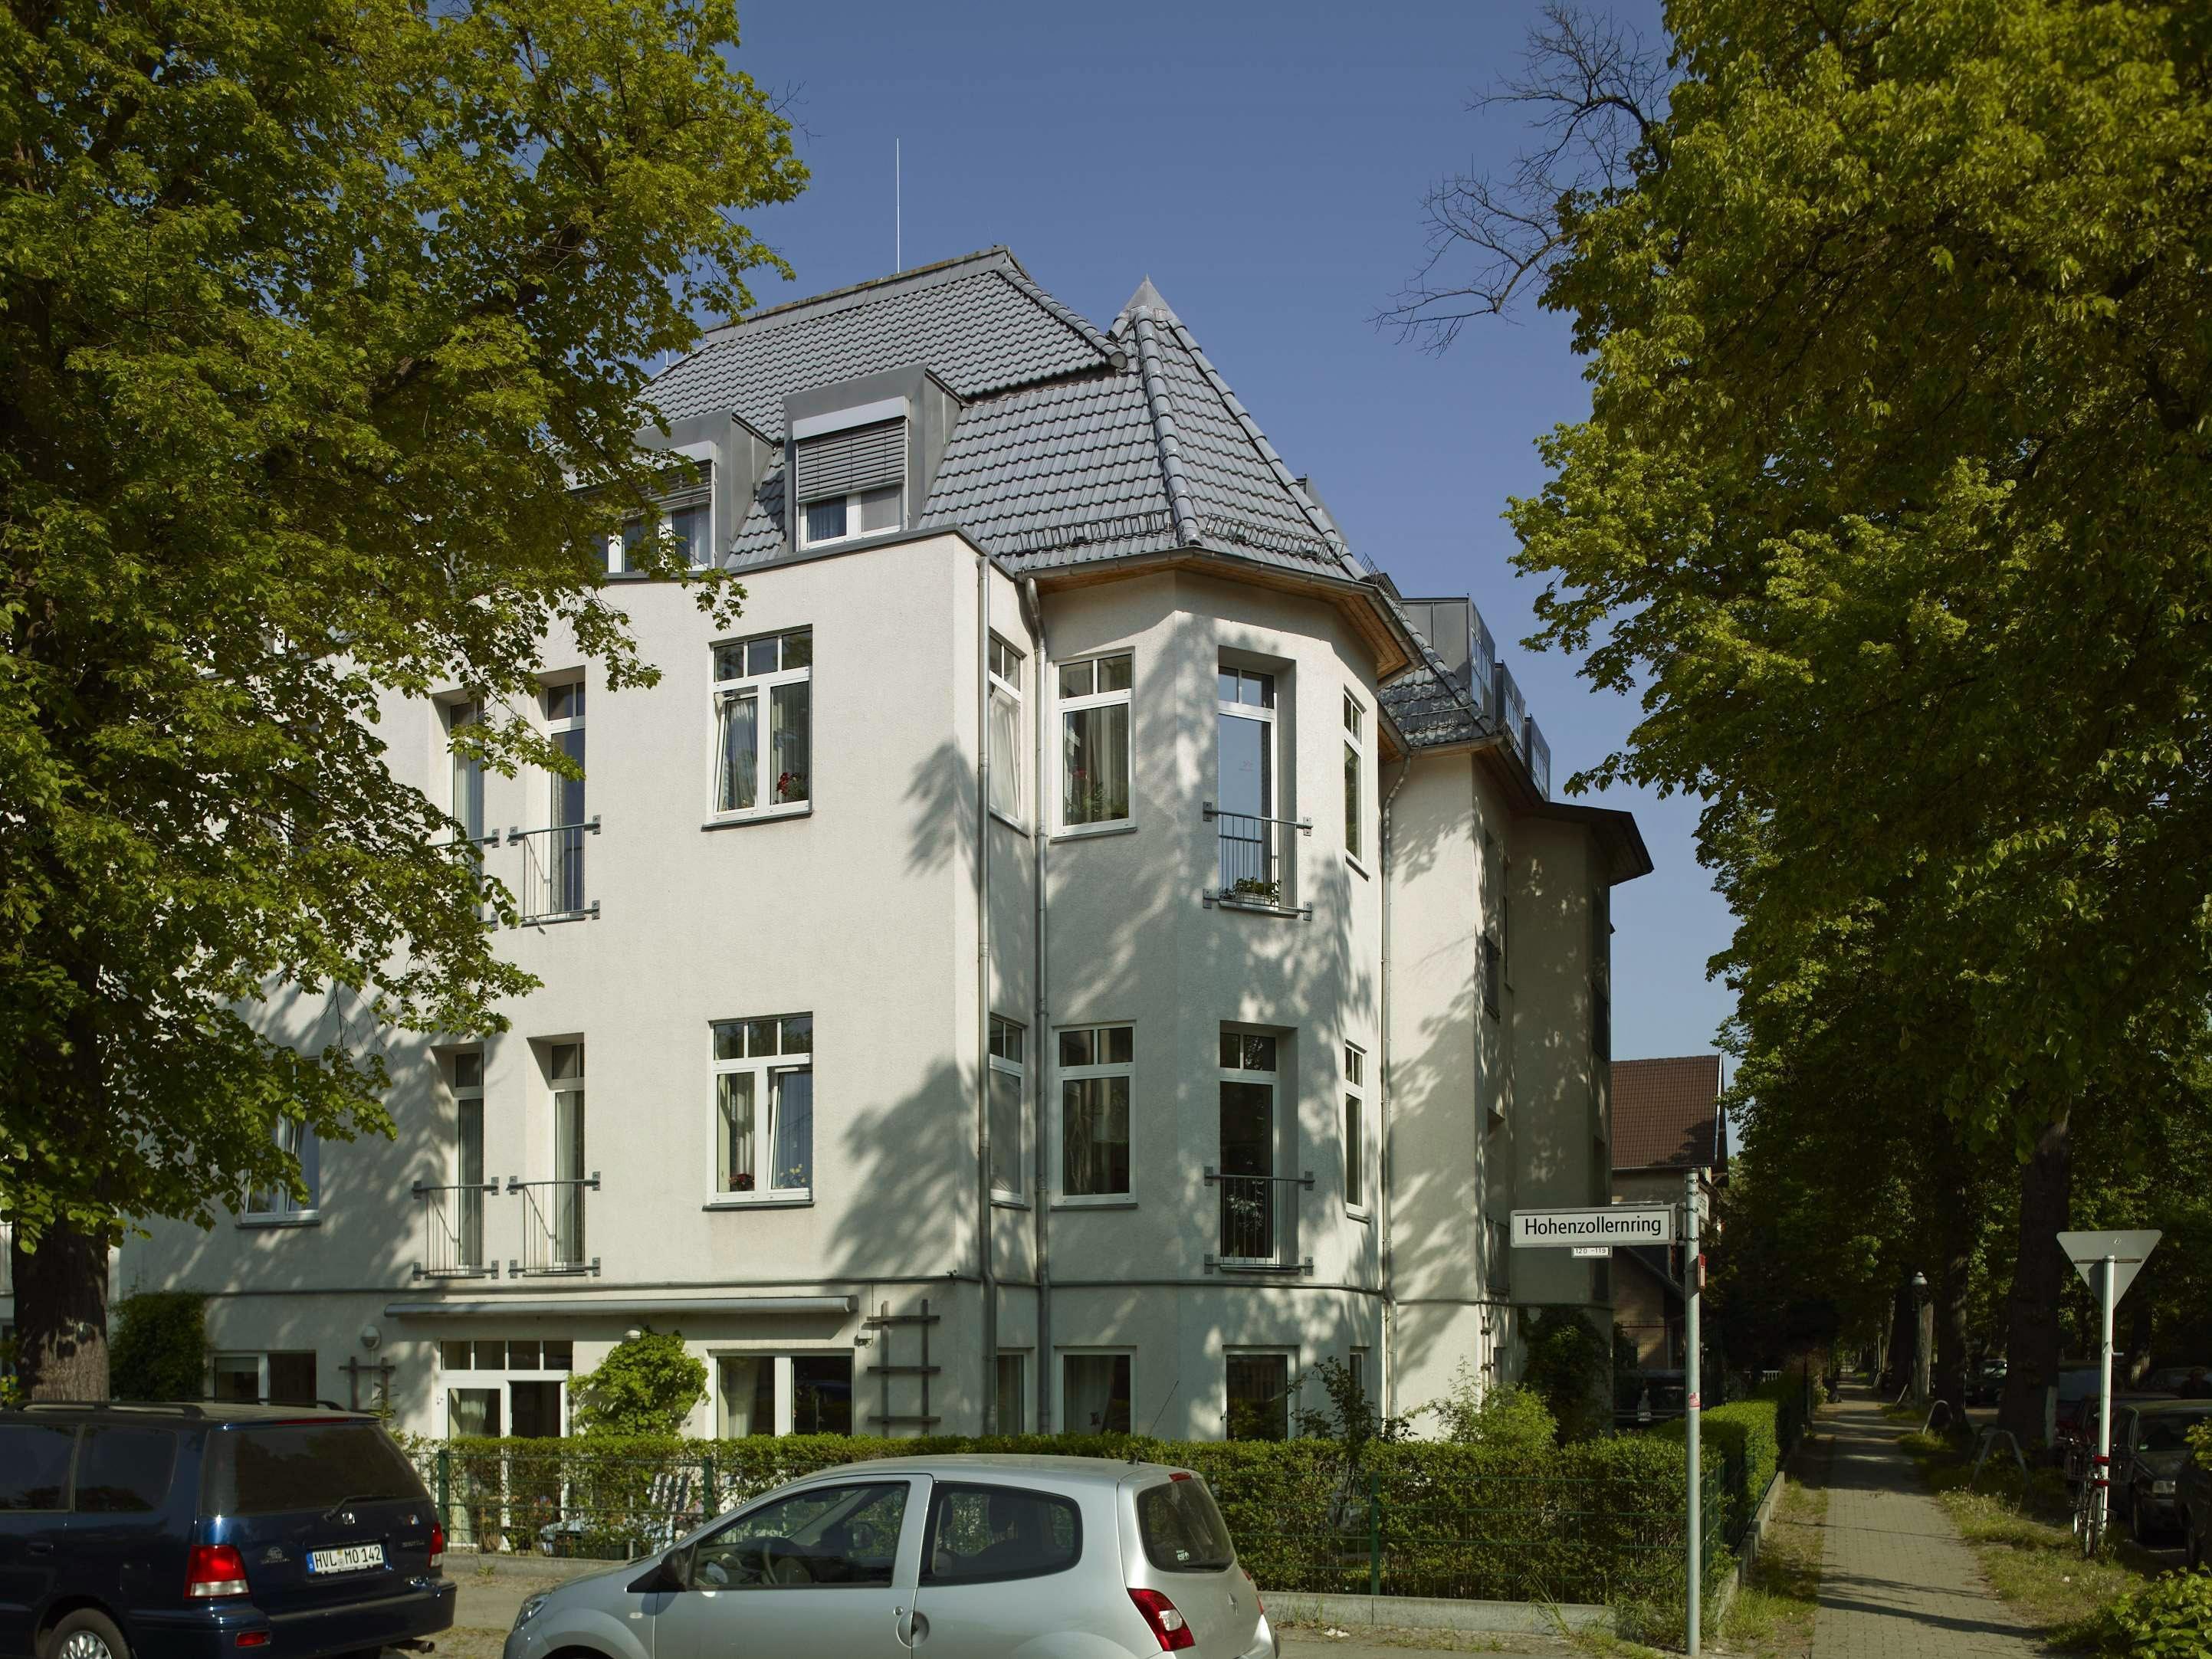 Fischer-Dittmer-Heim, Ev. stat. Pflegeeinrichtung